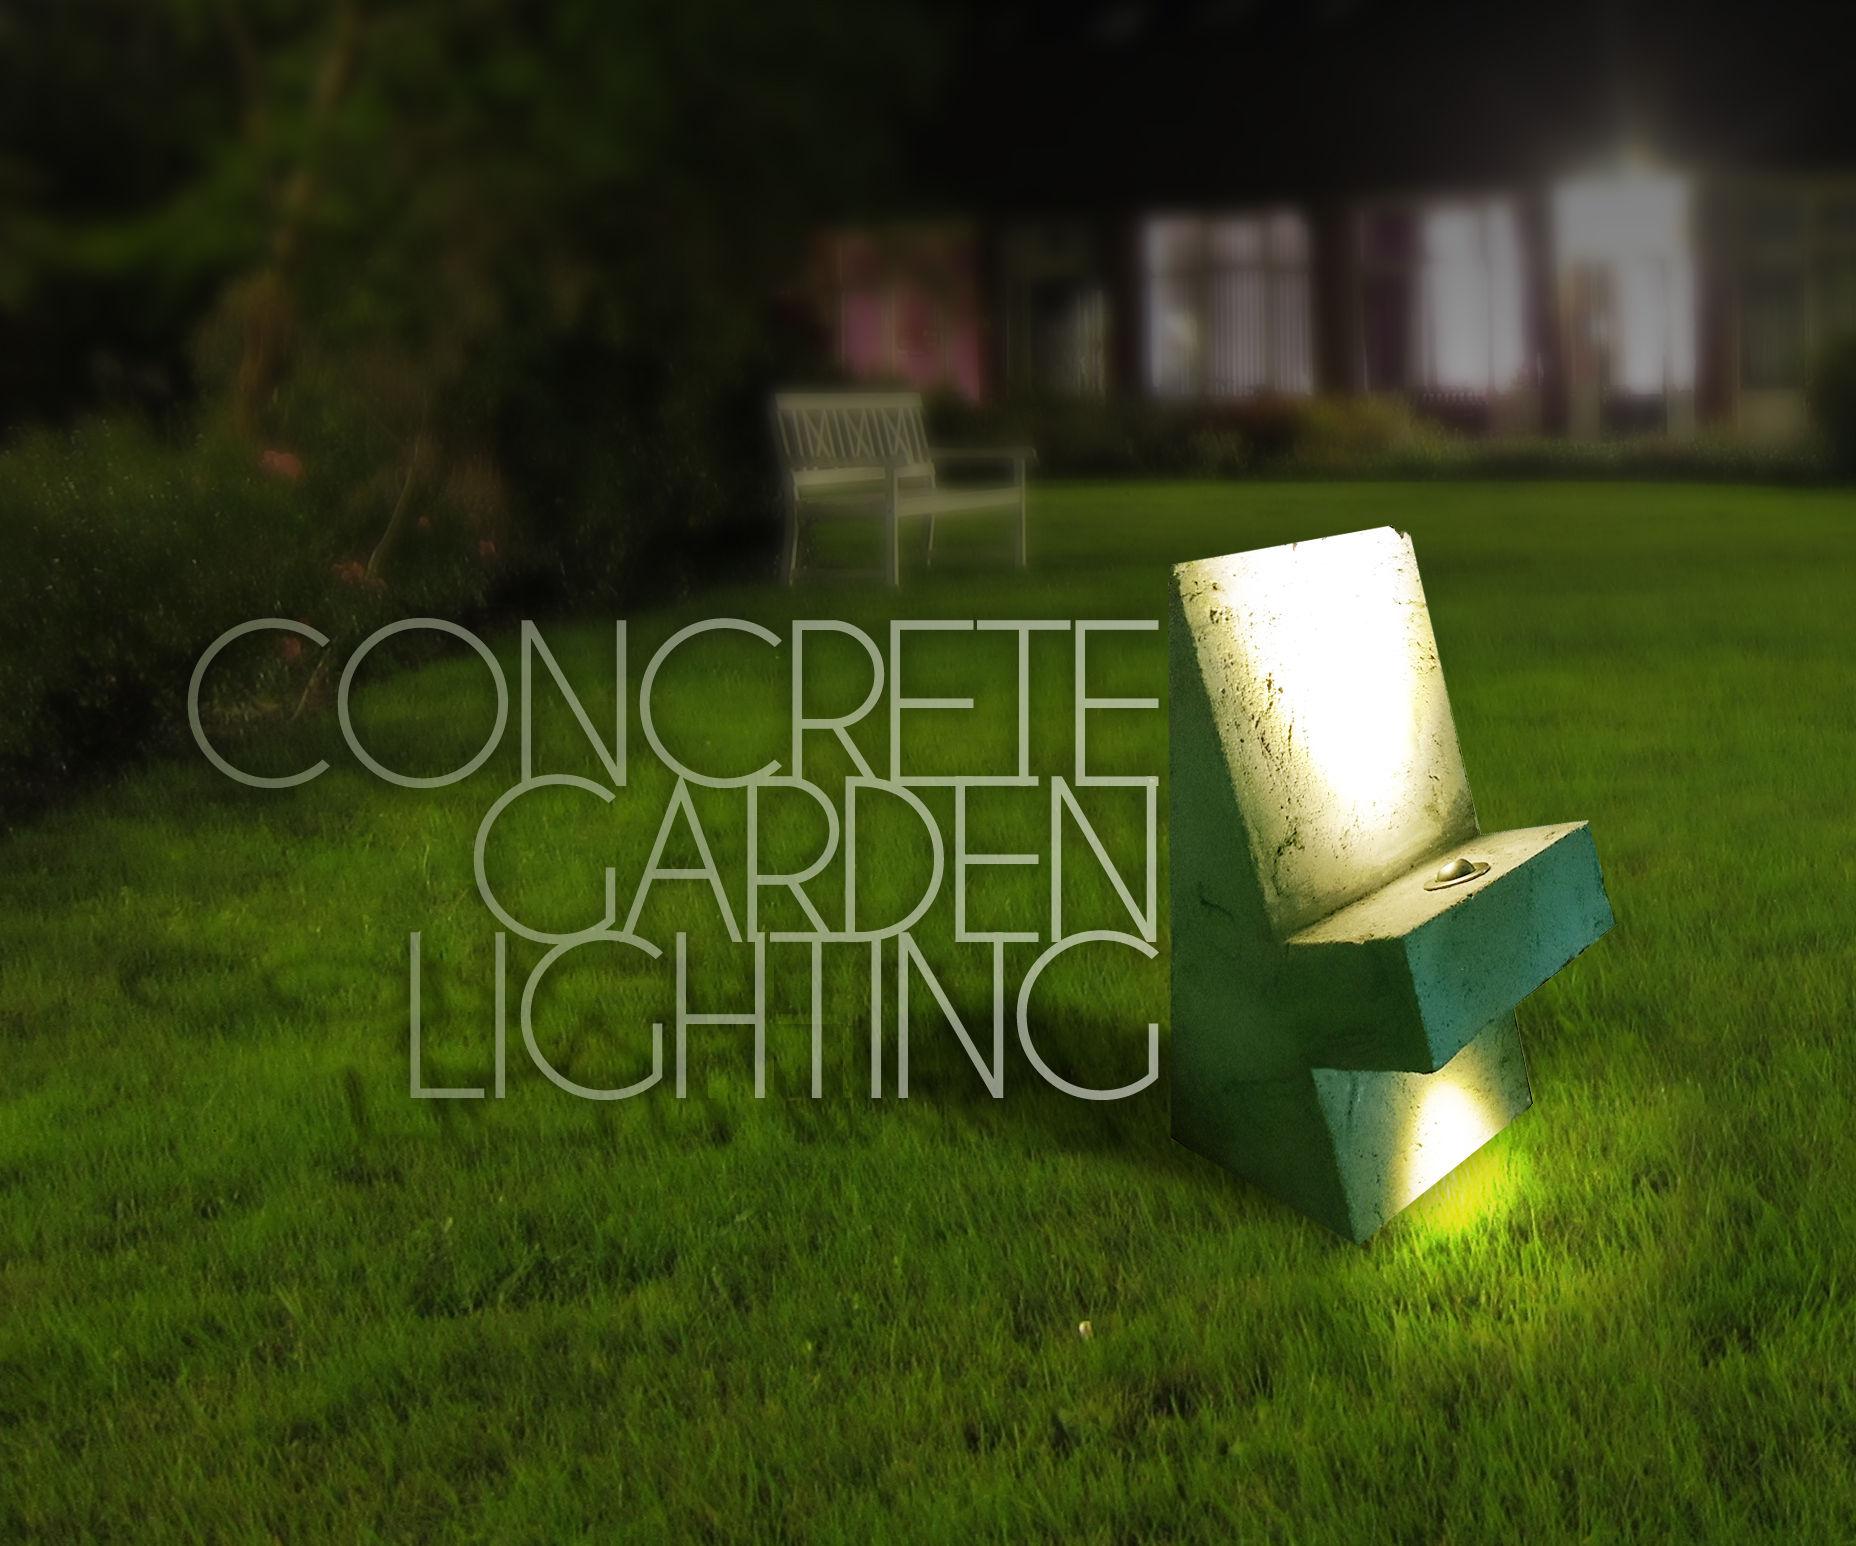 Concrete Garden Lighting